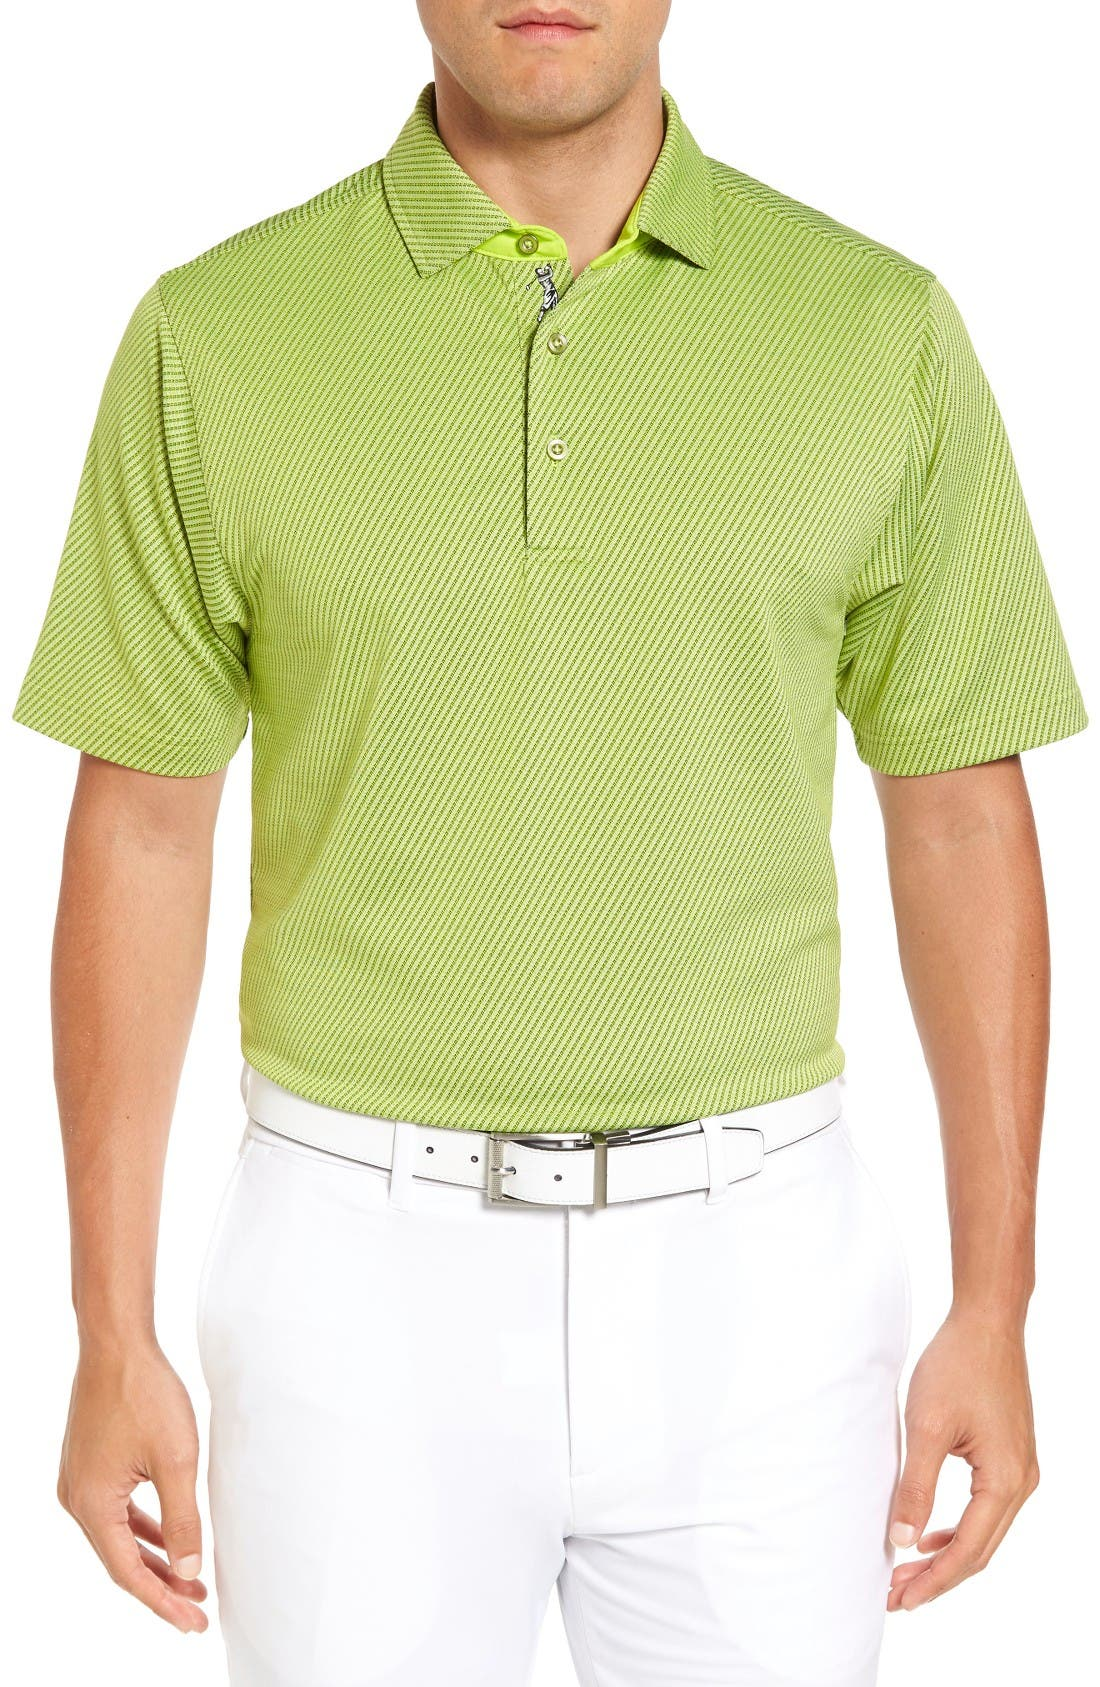 Bobby Jones XH20 Freckle Jacquard Stretch Golf Polo